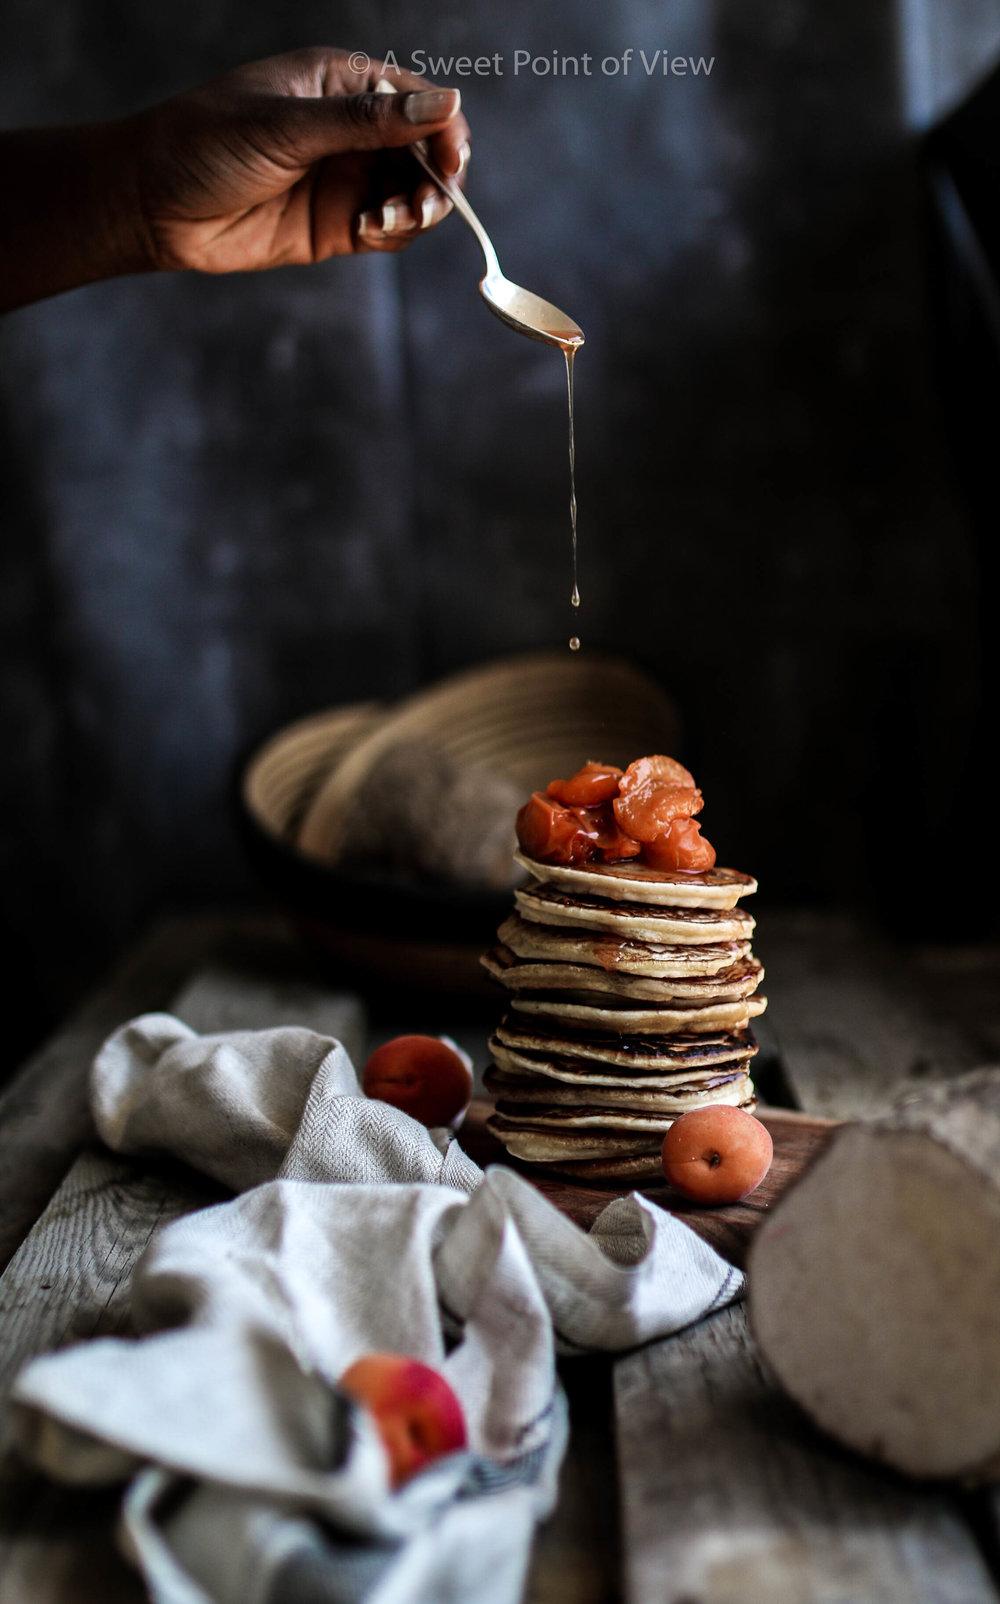 Yam-Flour-Pancakes-Homemade-Apricot-Yam-9-of-1-1.jpg